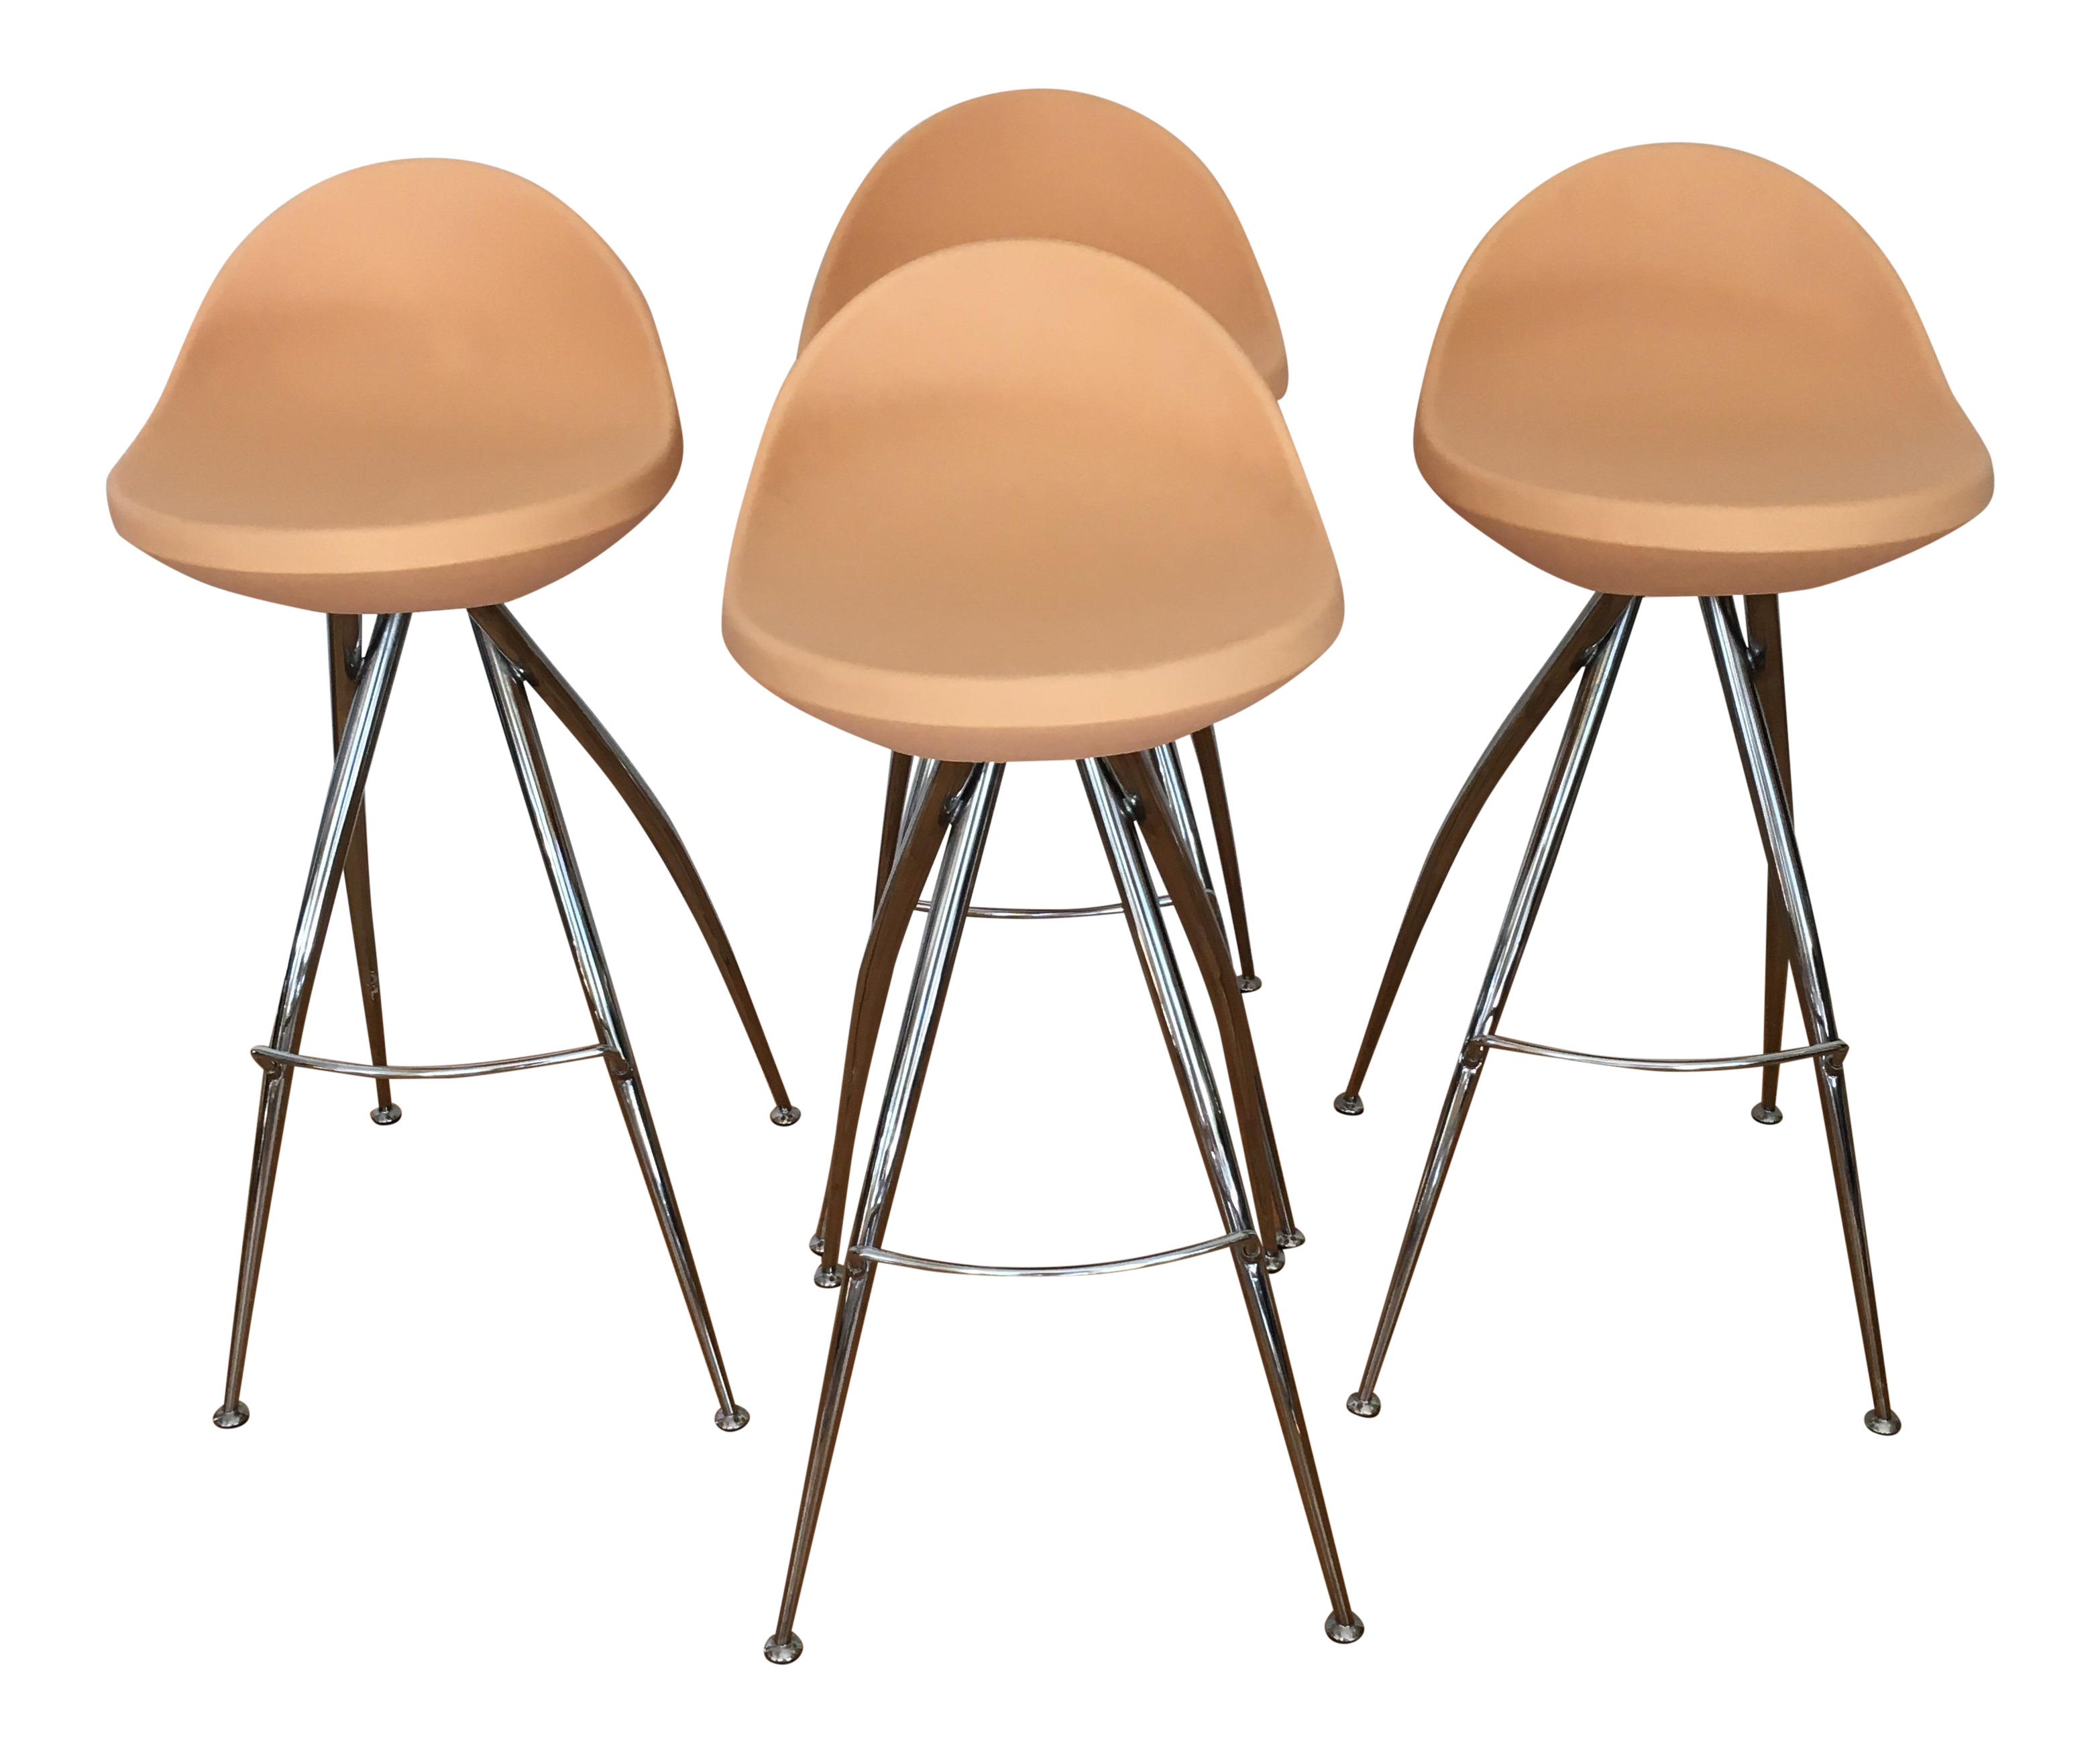 Admirable Roberto Foschia Italian Midj Bar Stools Set Of 4 Creativecarmelina Interior Chair Design Creativecarmelinacom